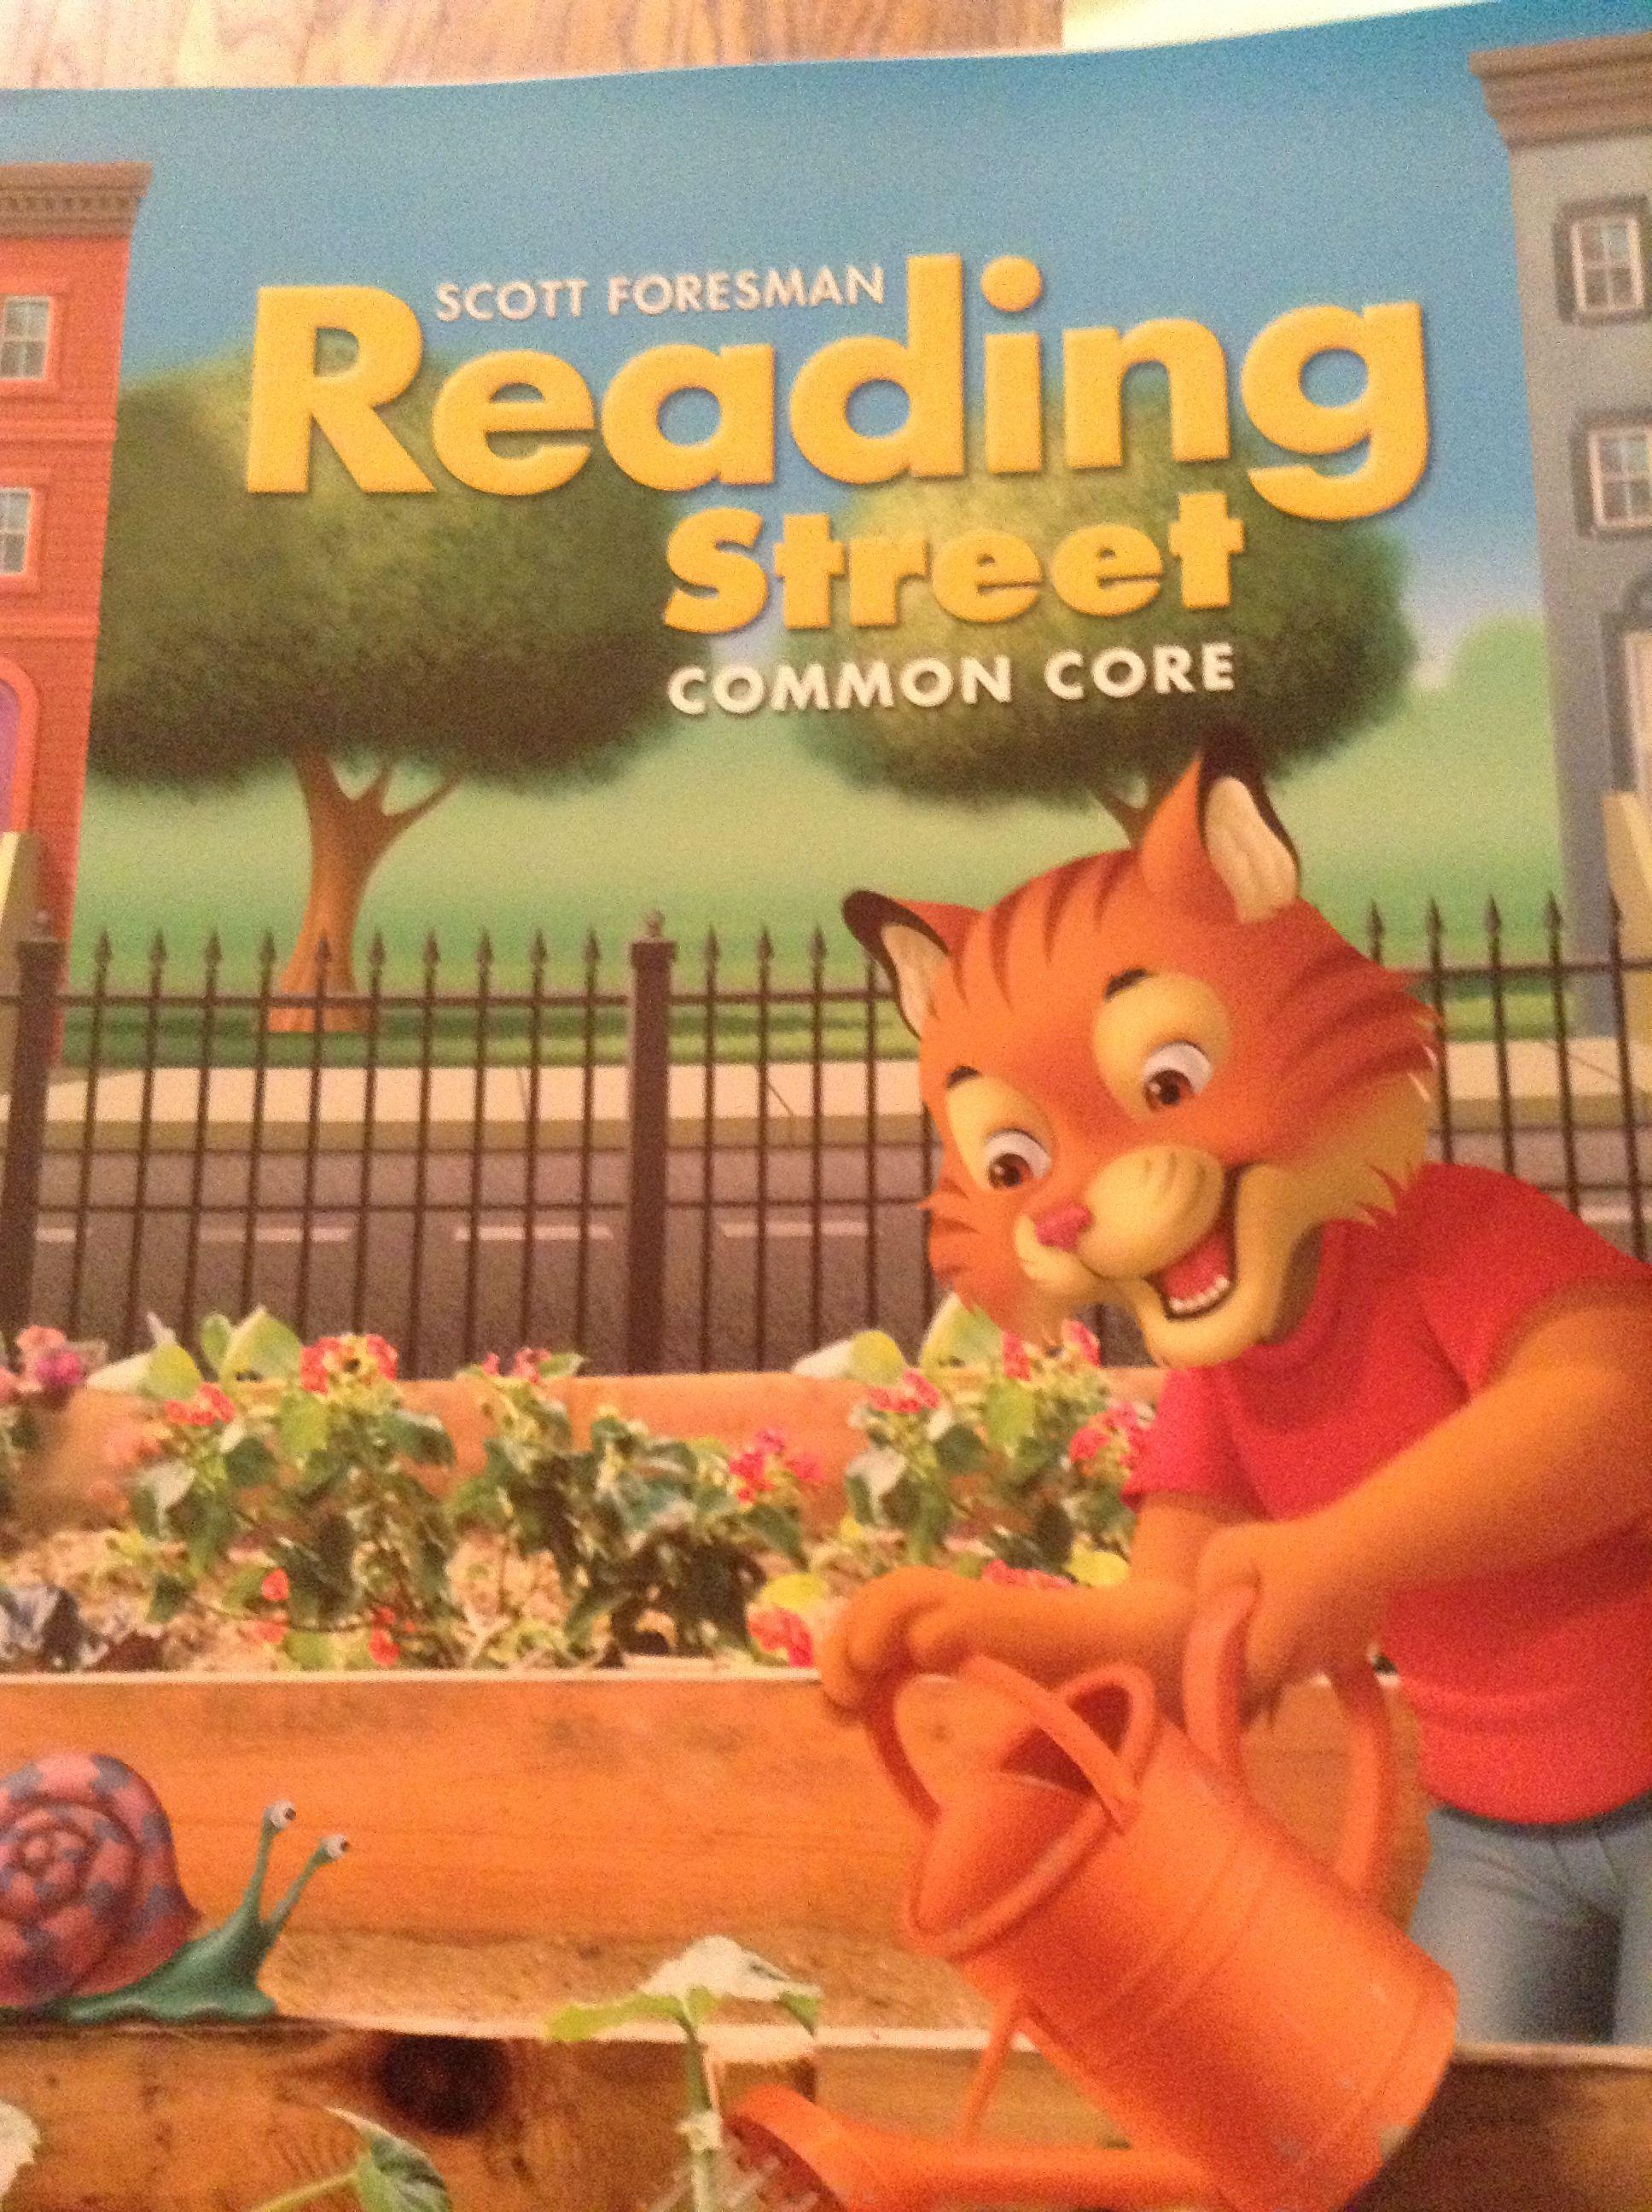 Scott Foresman Reading Street Common Core Second Grade